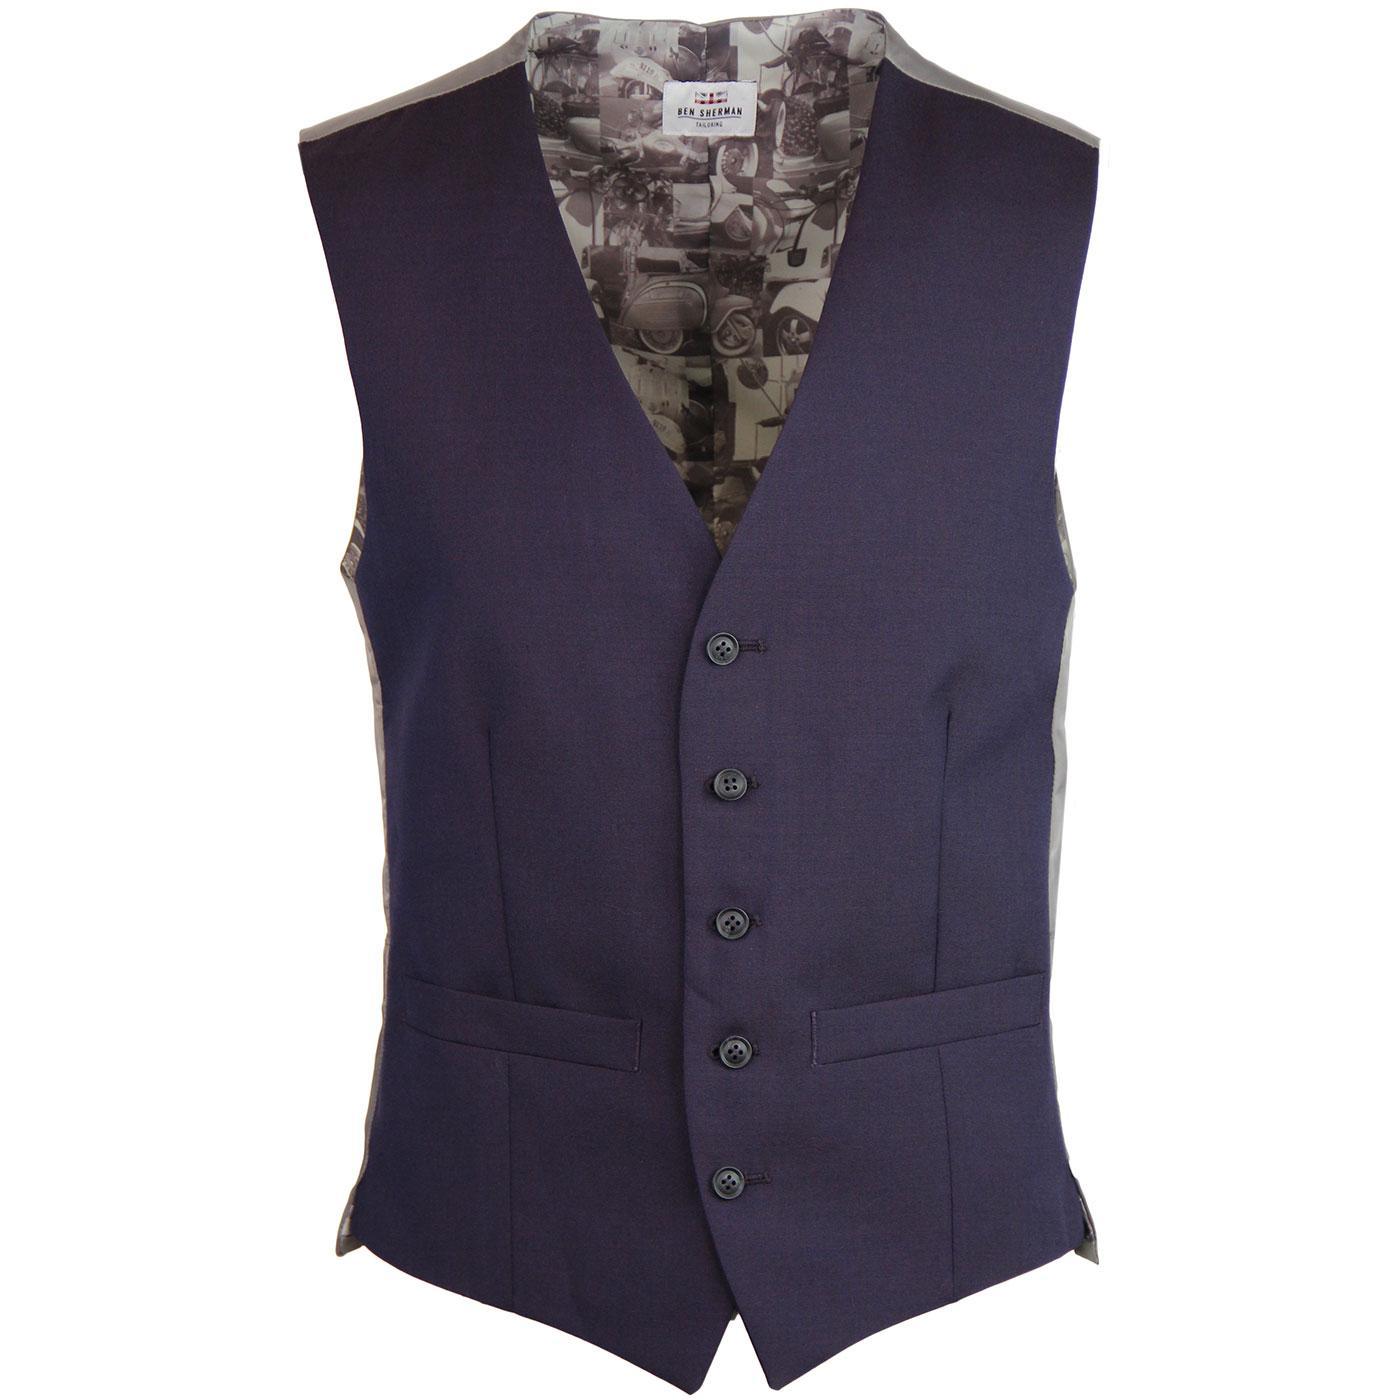 BEN SHERMAN Tailoring 60s Mod Tonic Waistcoat (A)